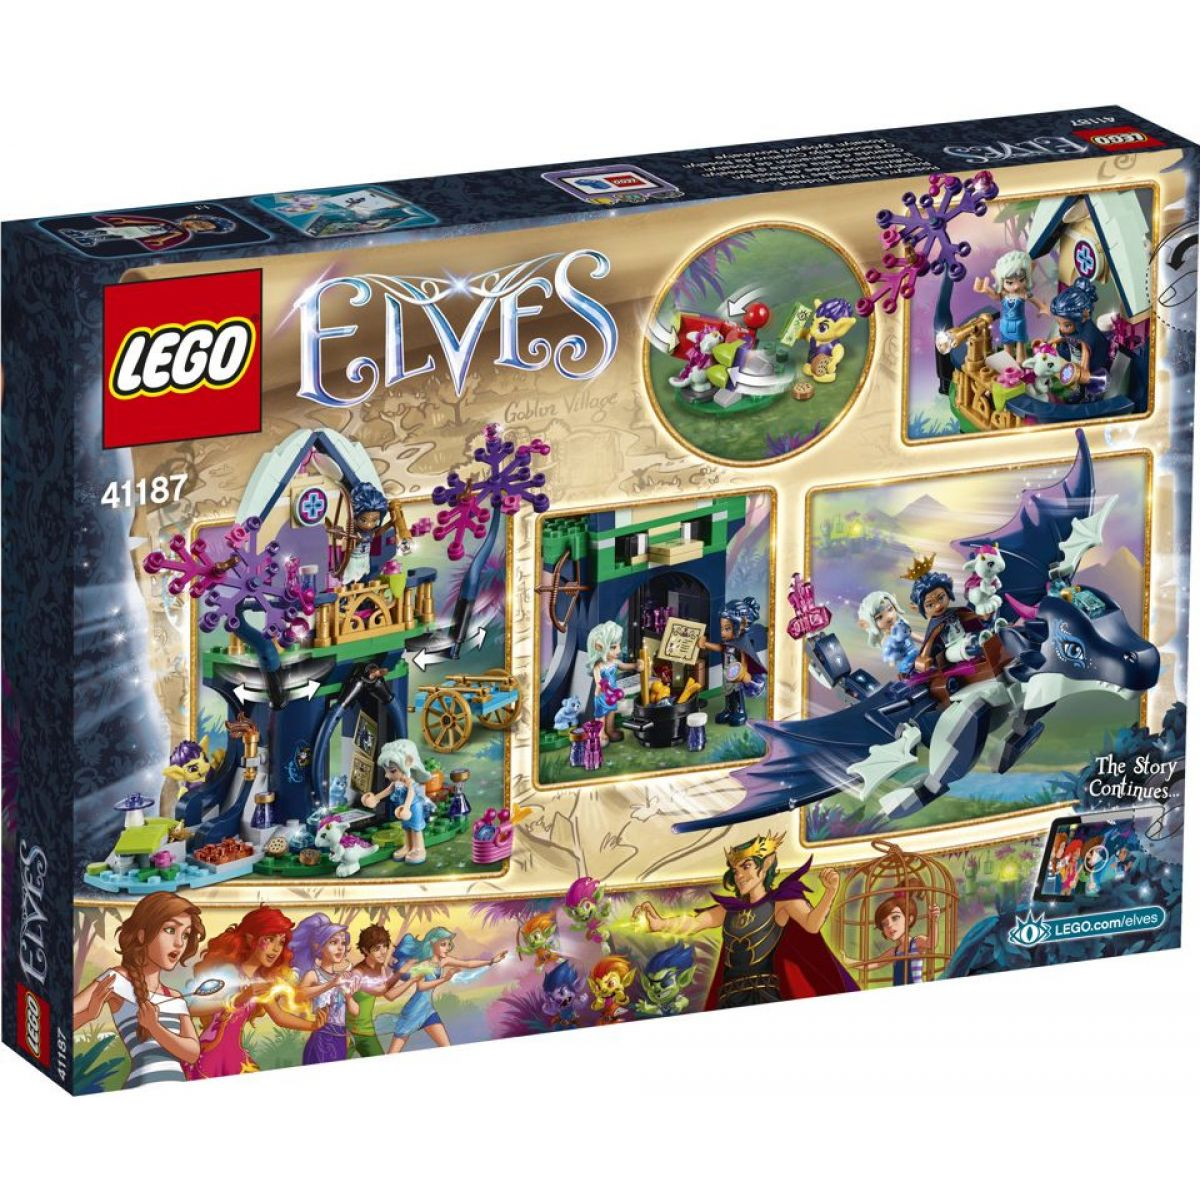 LEGO Elves 41187 Rosalyna léčivá skrýš #2